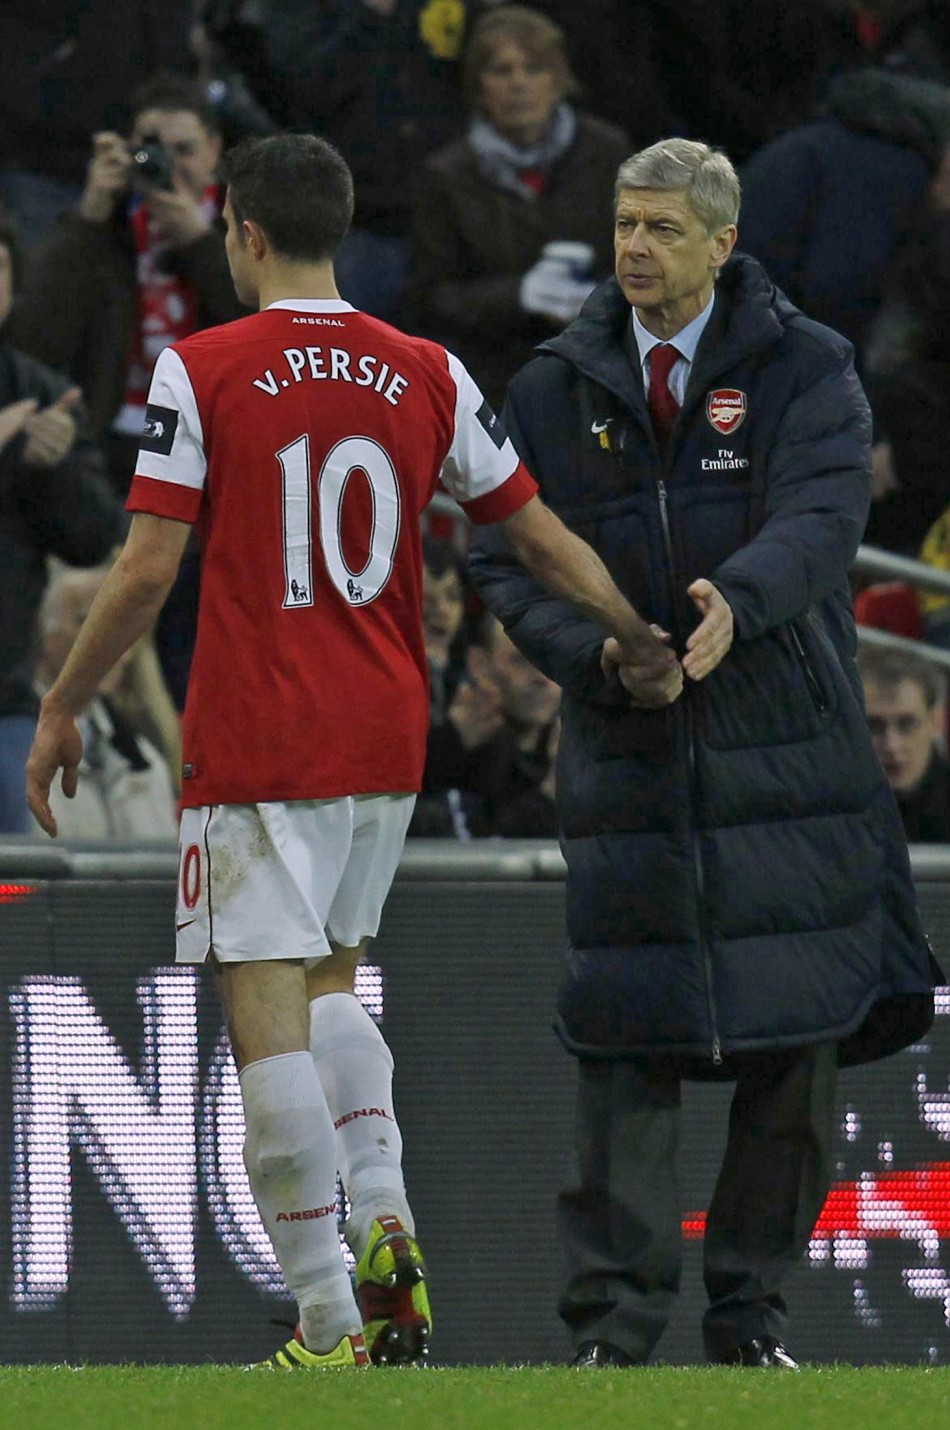 Arsenal's Arsene Wenger and Robin van Persie